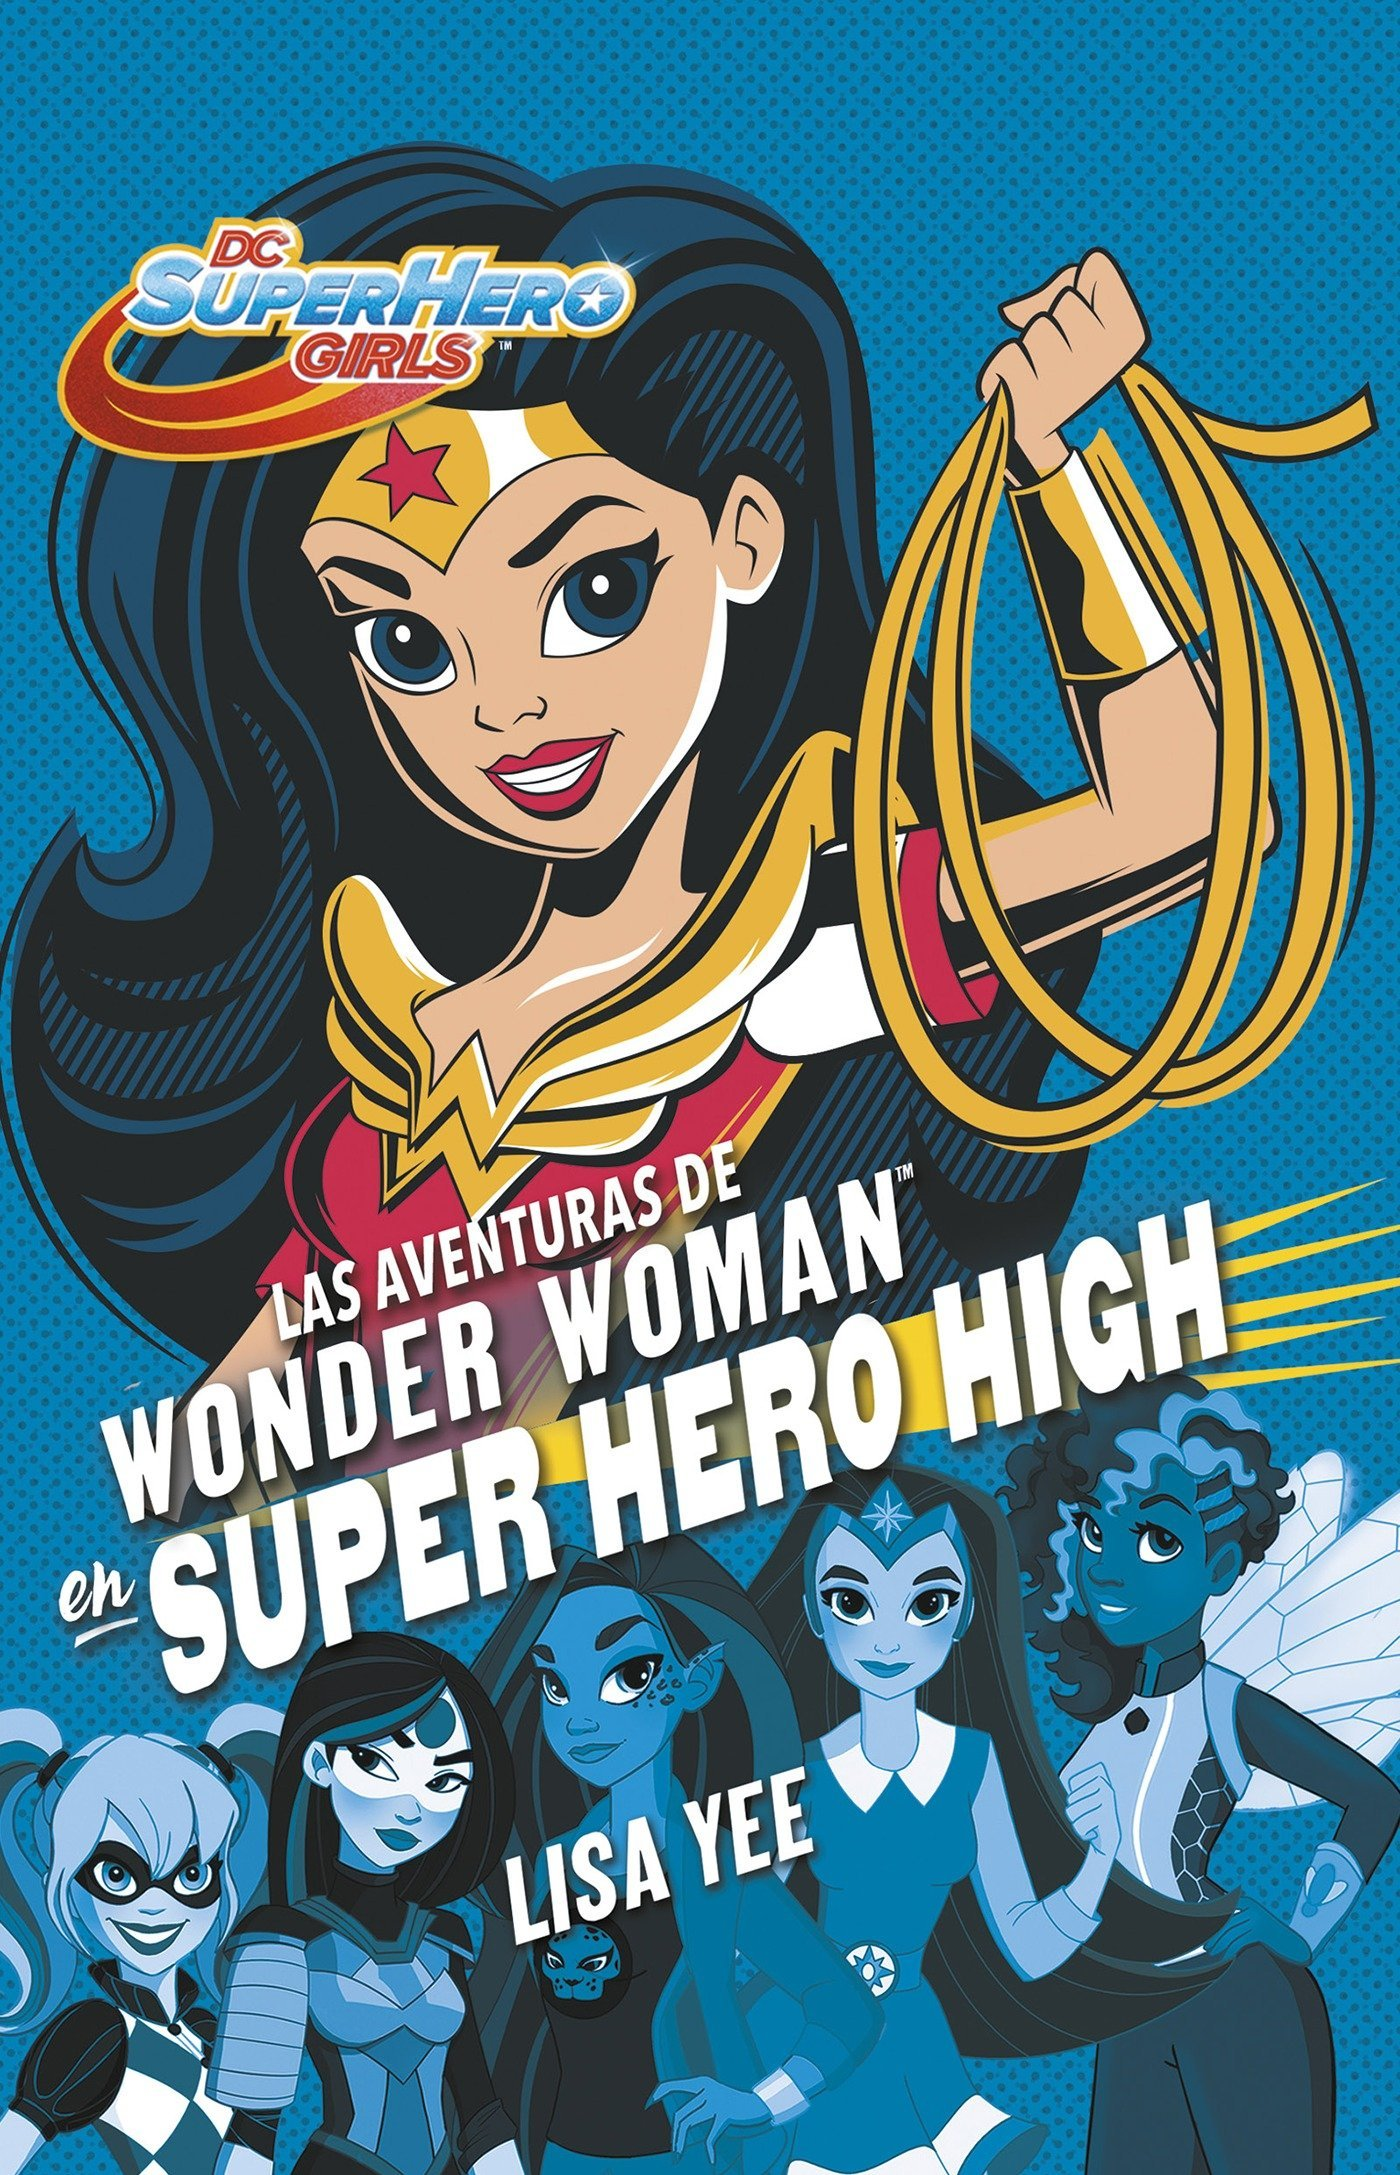 Las aventuras de Wonder Woman en Super Hero High / Wonder Woman at Super Hero Hi gh (DC Super Hero Girls) (Spanish Edition) by Montena